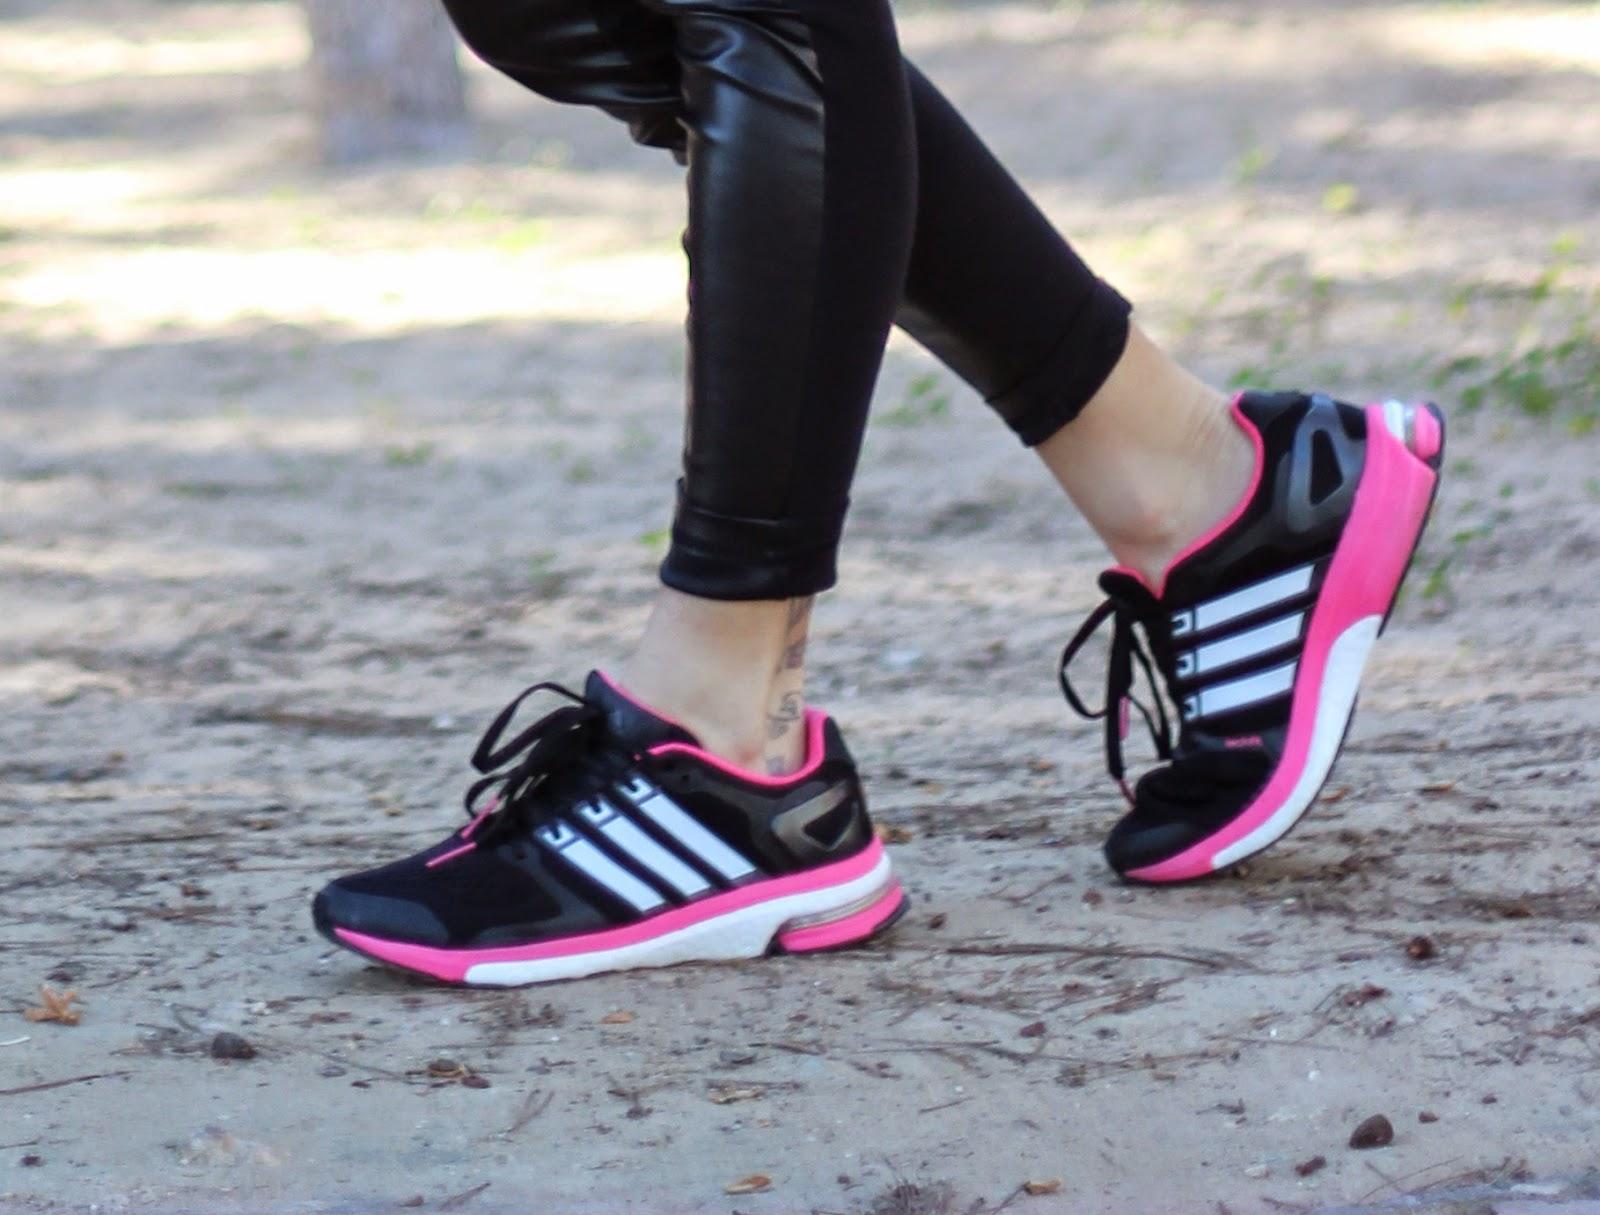 Sporty outfit - Adidas boost - Zapatillas deportivas - Fashion blogger - Bufanda manta